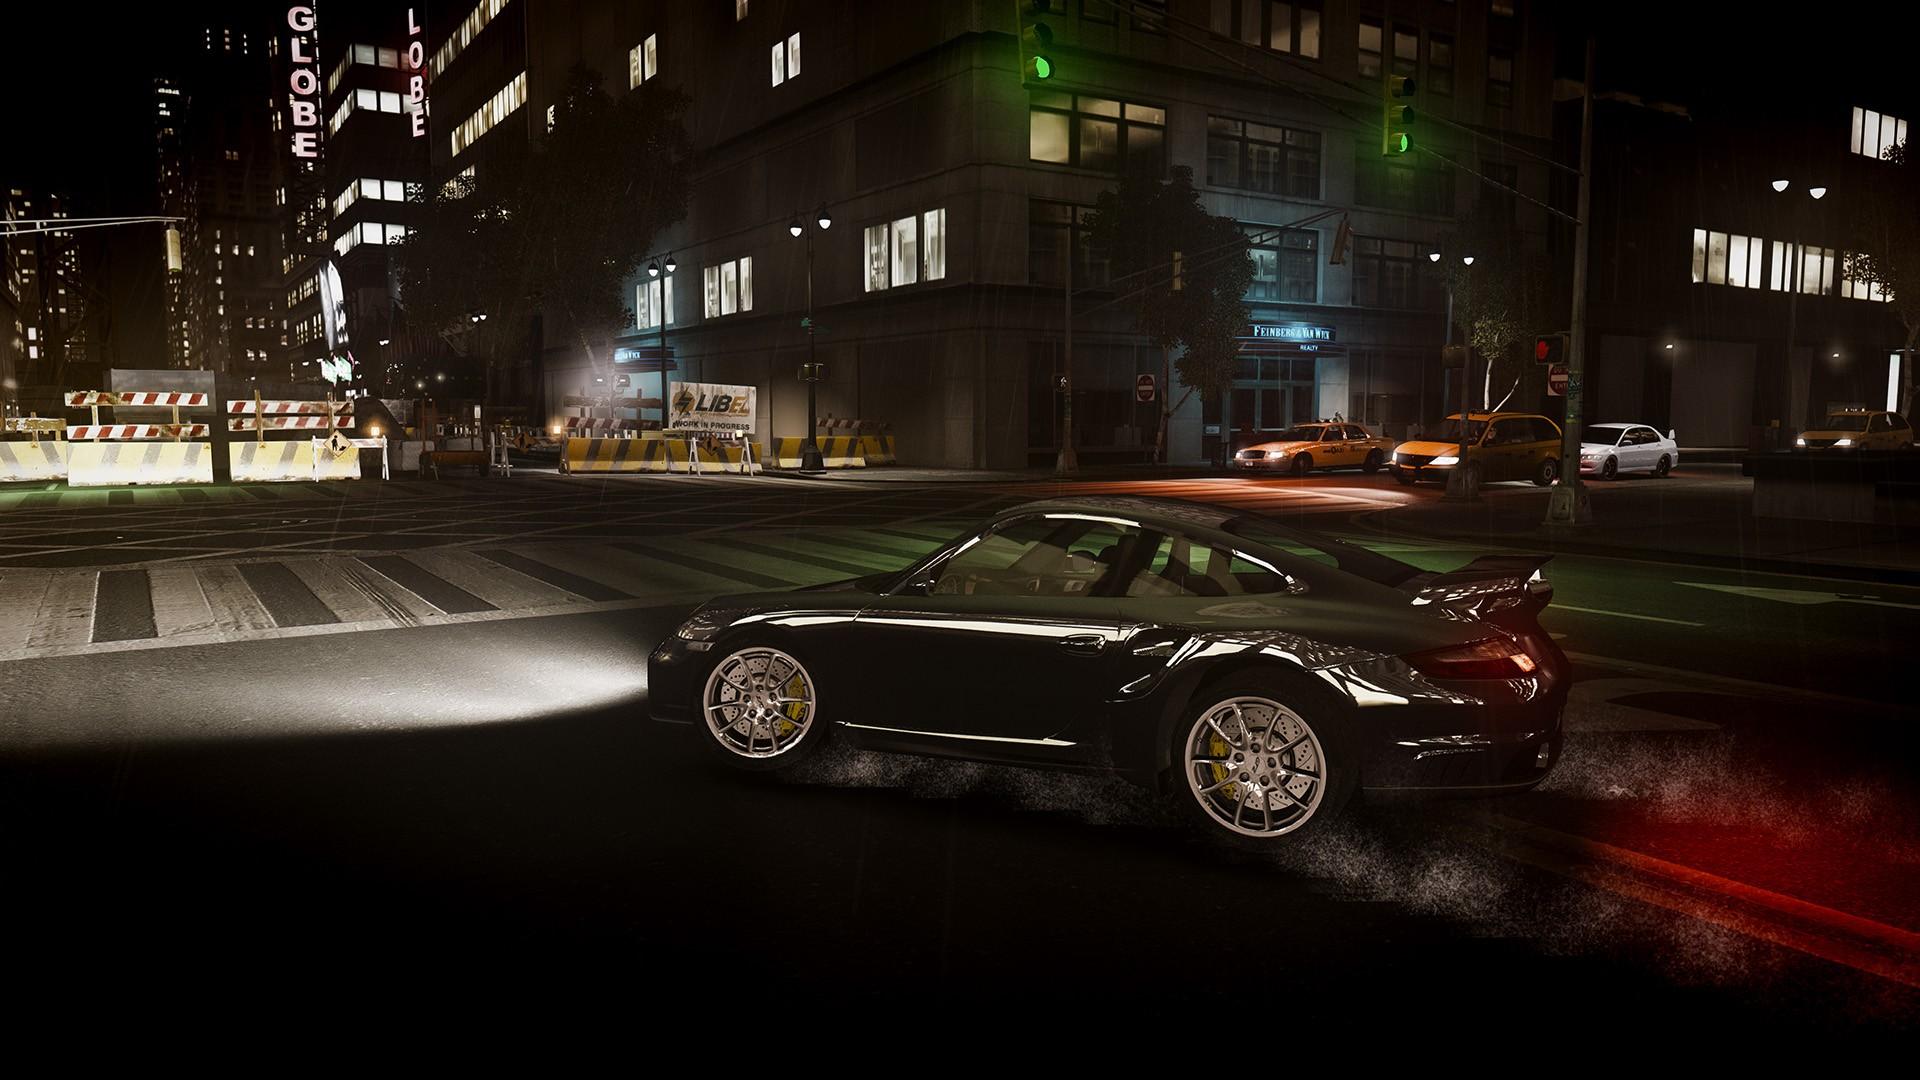 Fantastický pohled na GTA IV v 4K 88036